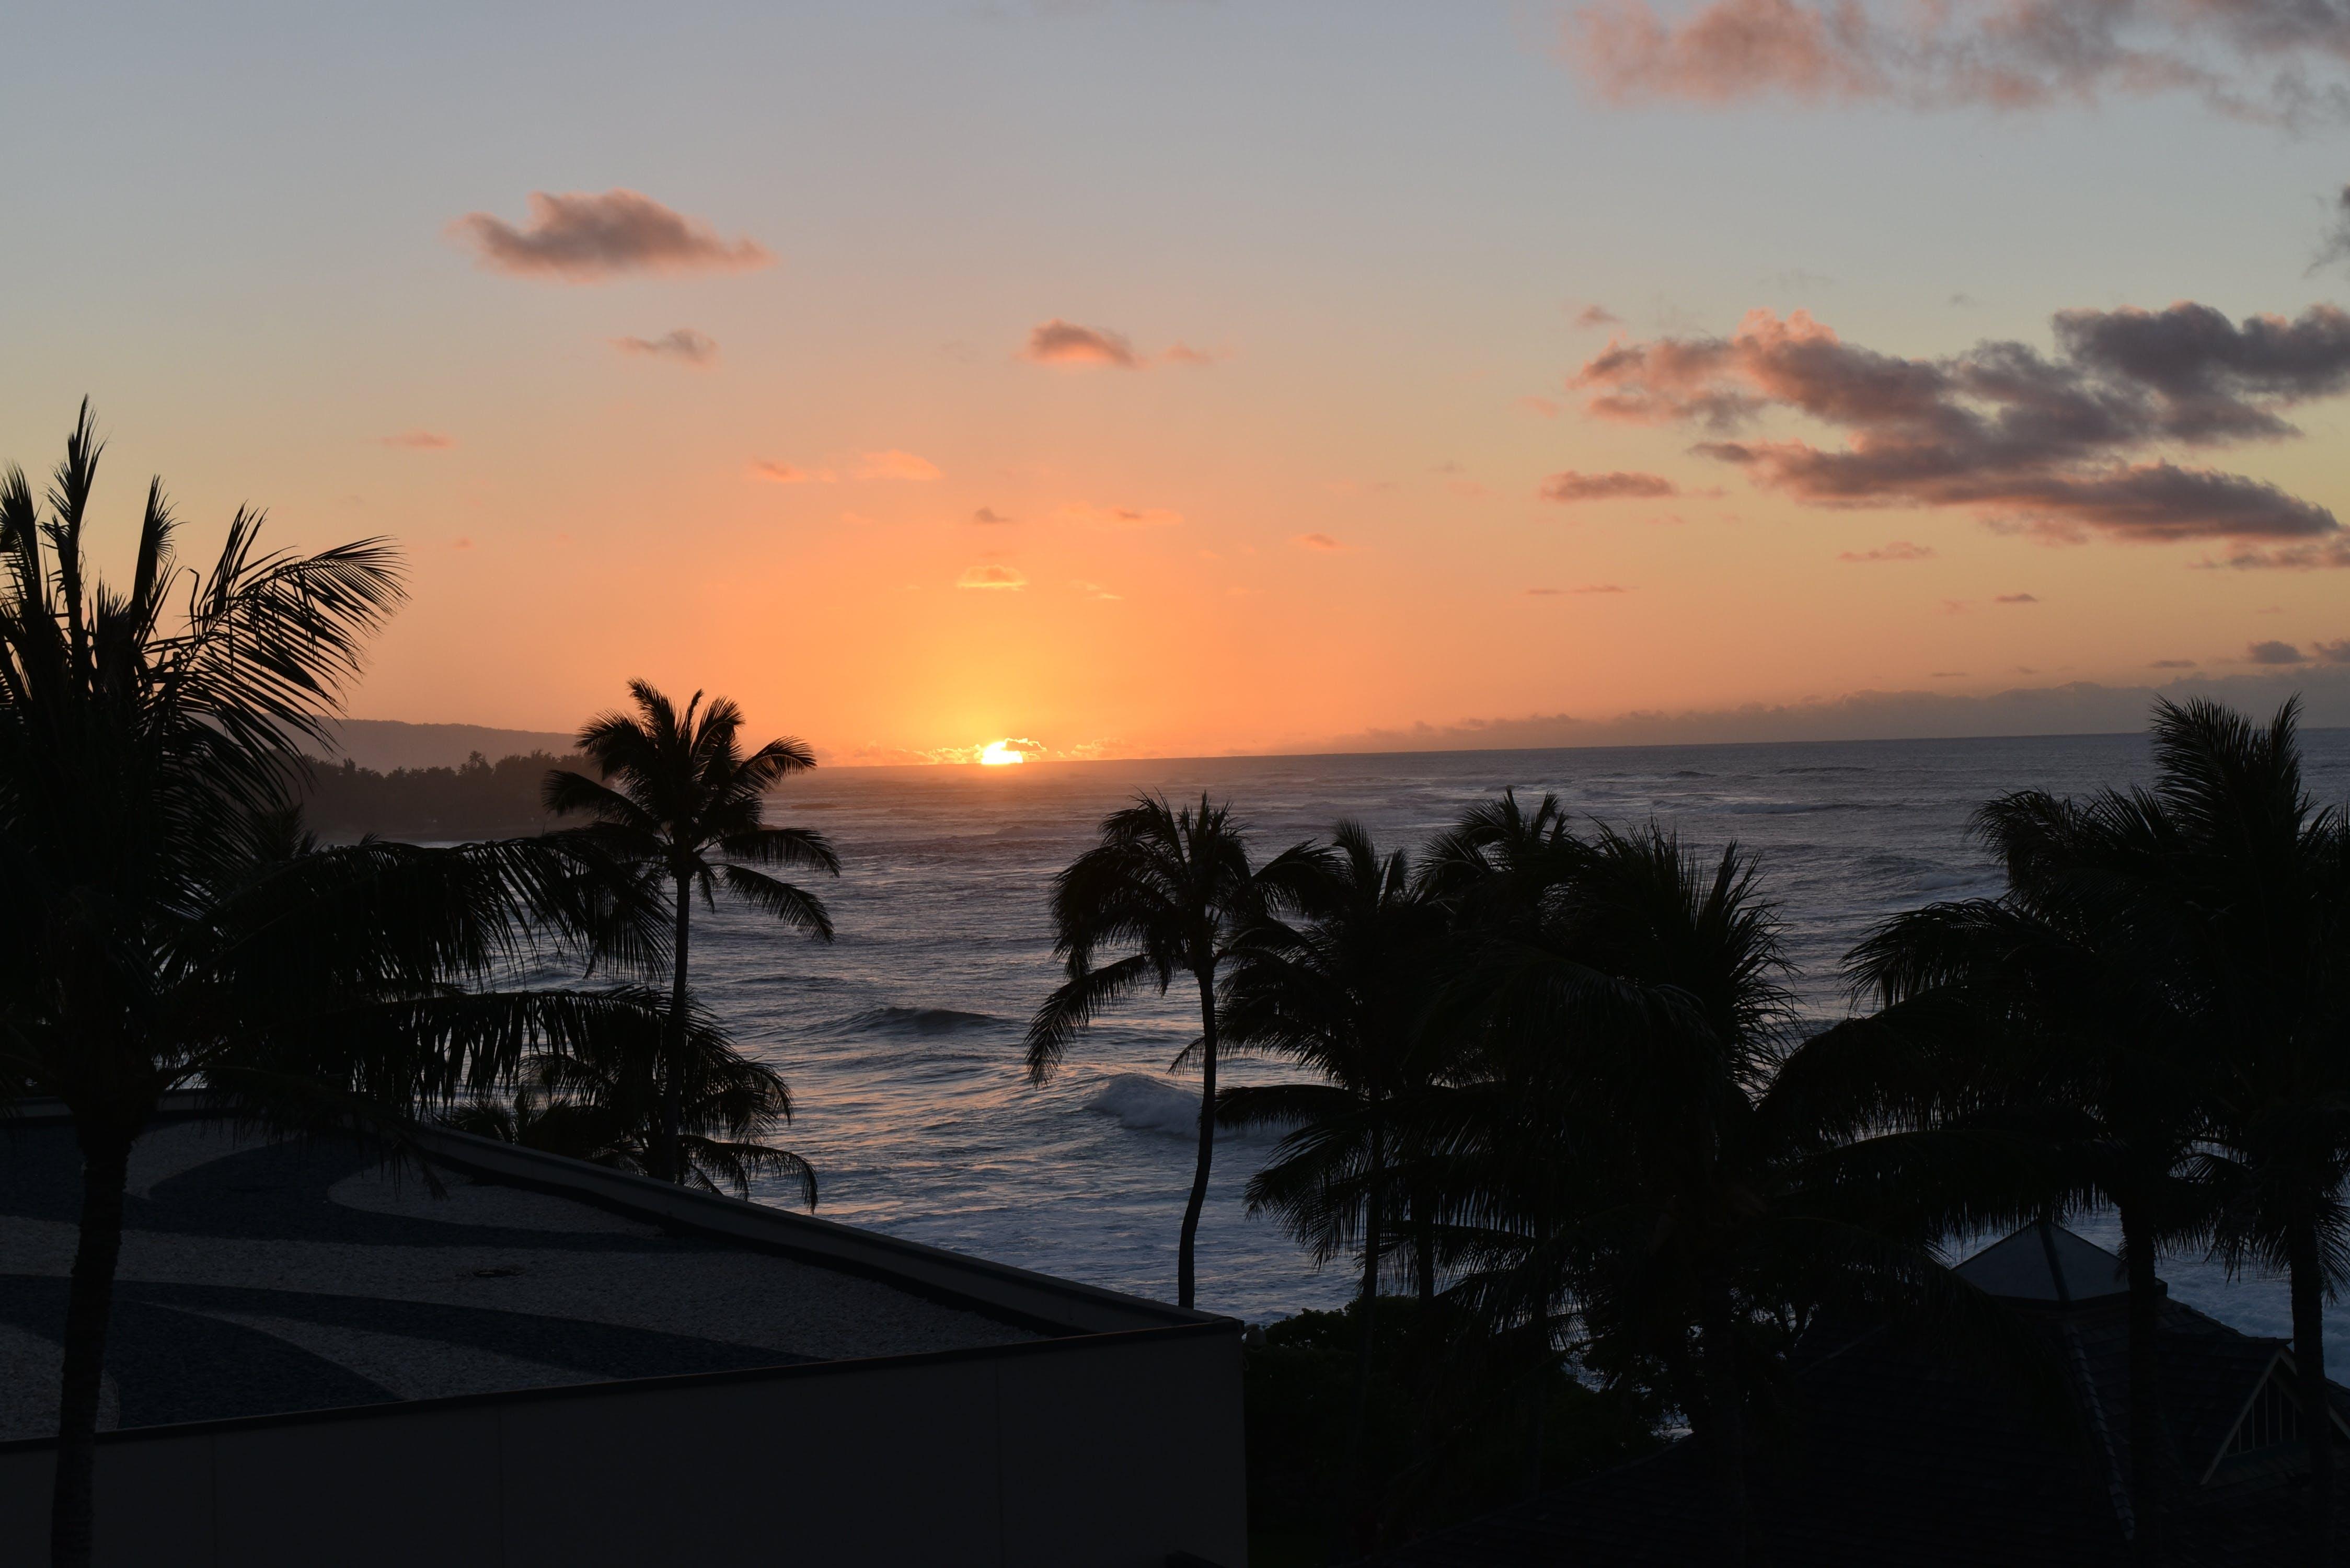 Free stock photo of sunset, sunset beach